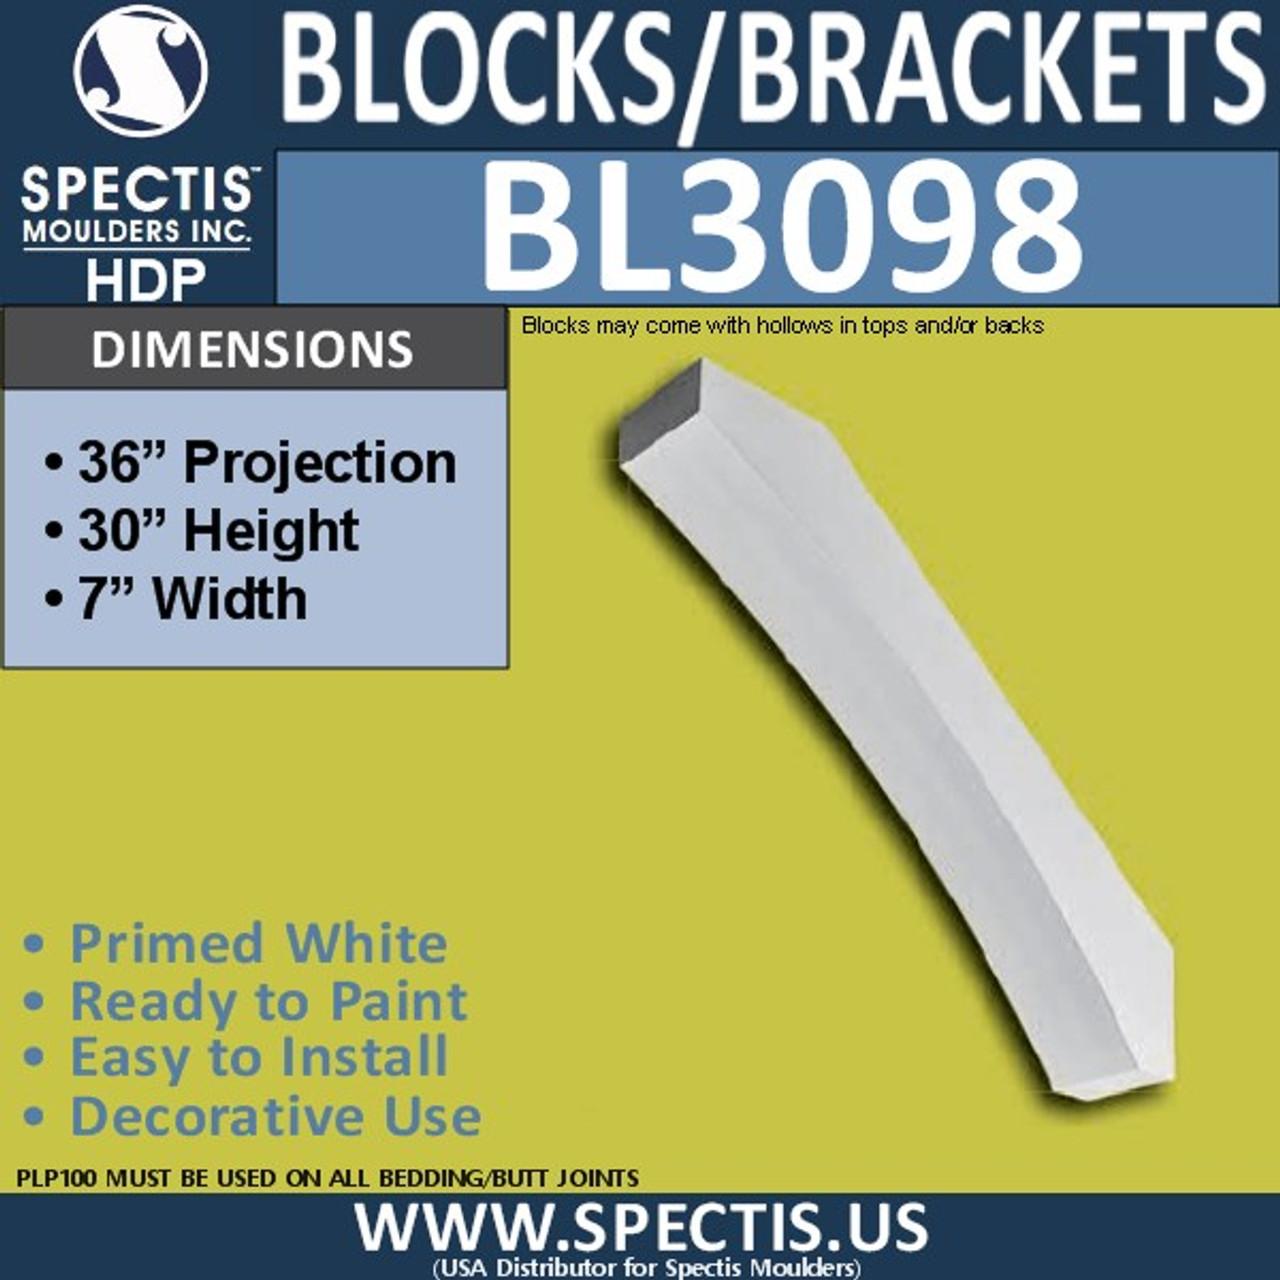 "BL3098 Eave Block or Bracket 7""W x 32""H x 36"" P"